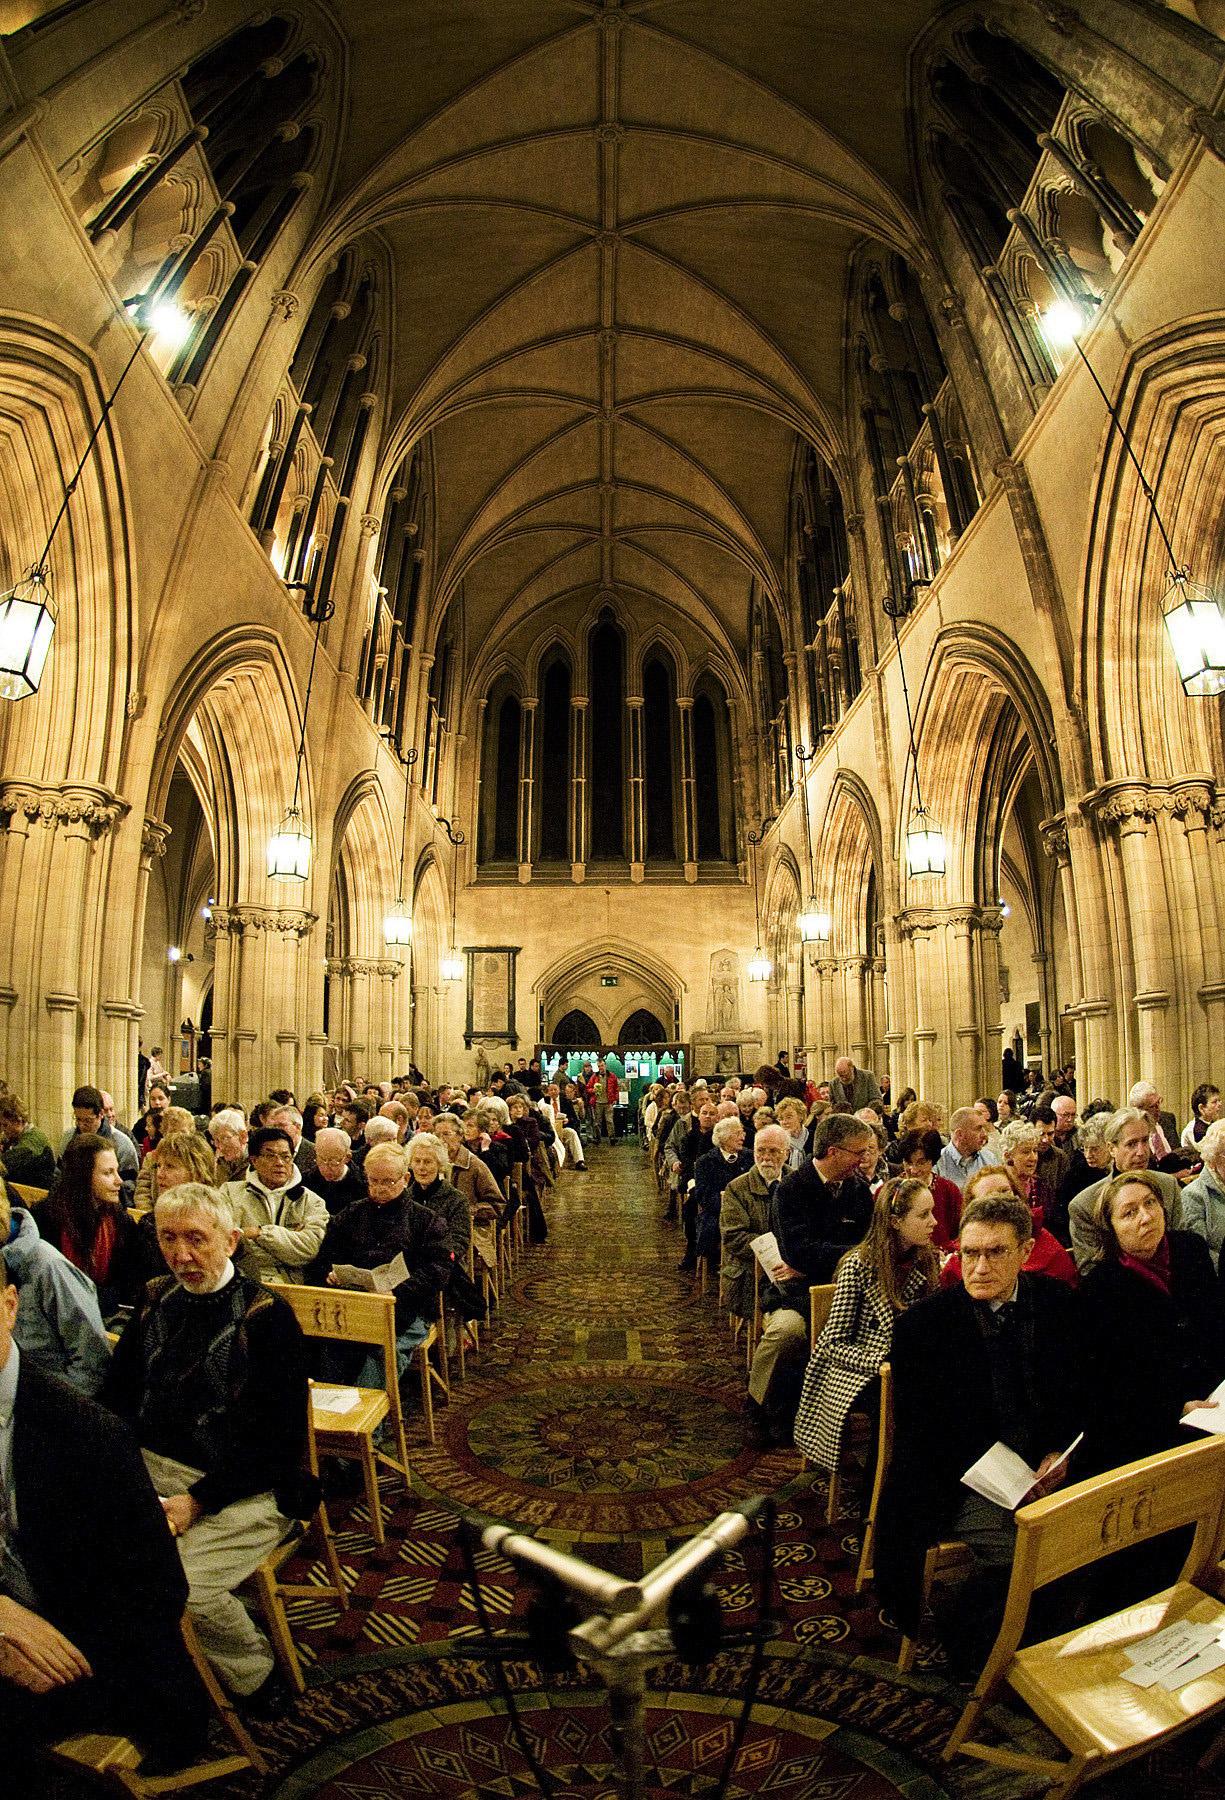 Inside Christ Church, Dublin. Photo courtesy of www.visitdublin.com